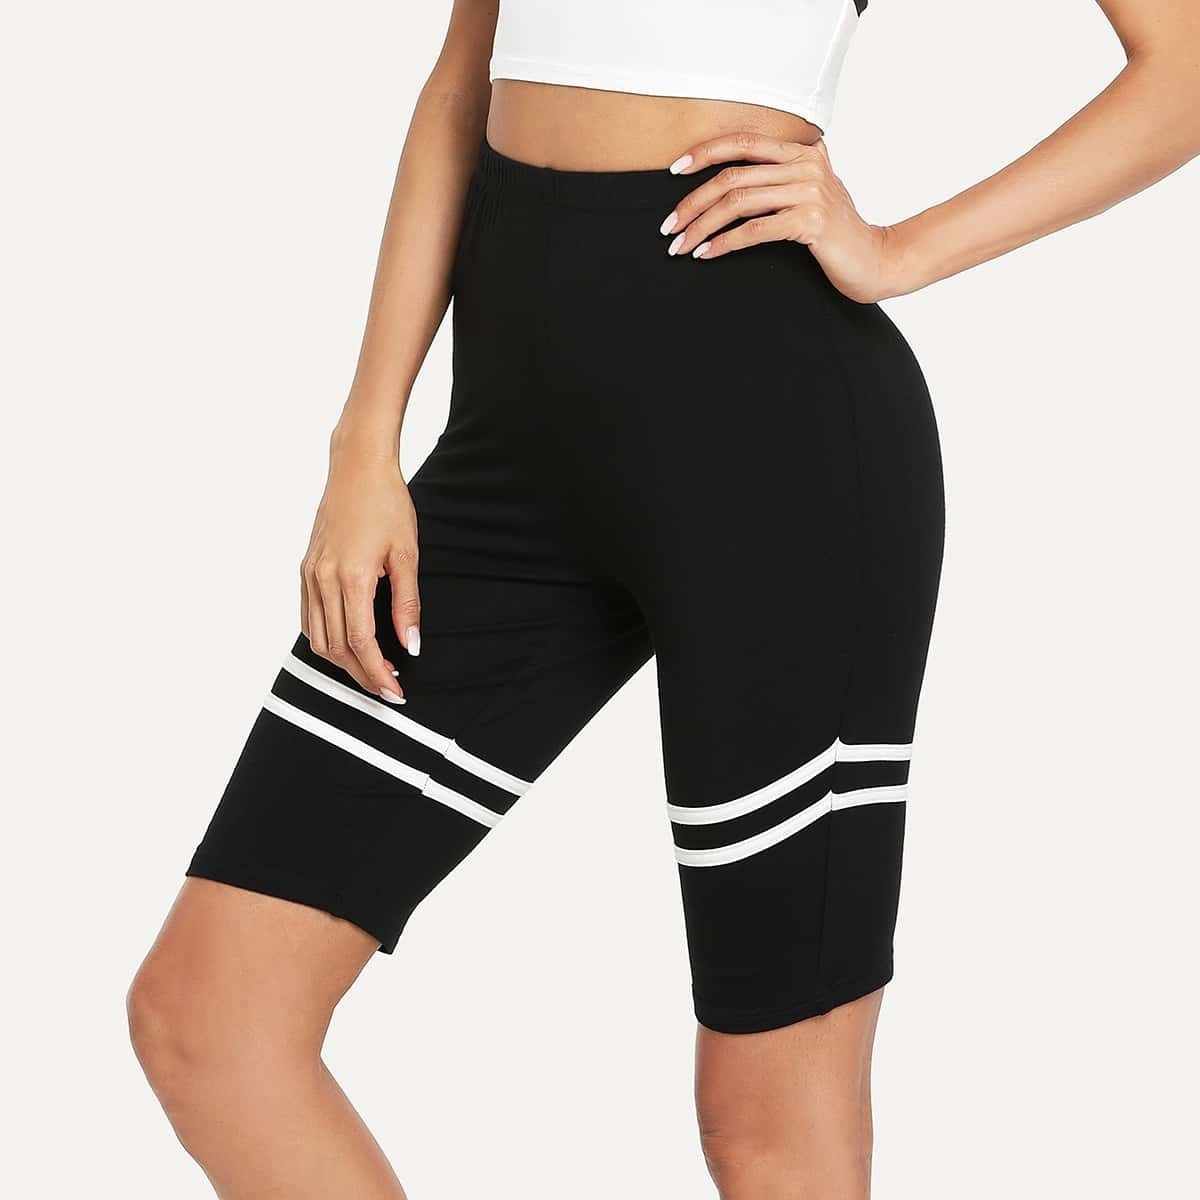 - Contrast Striped Trim Short Leggings